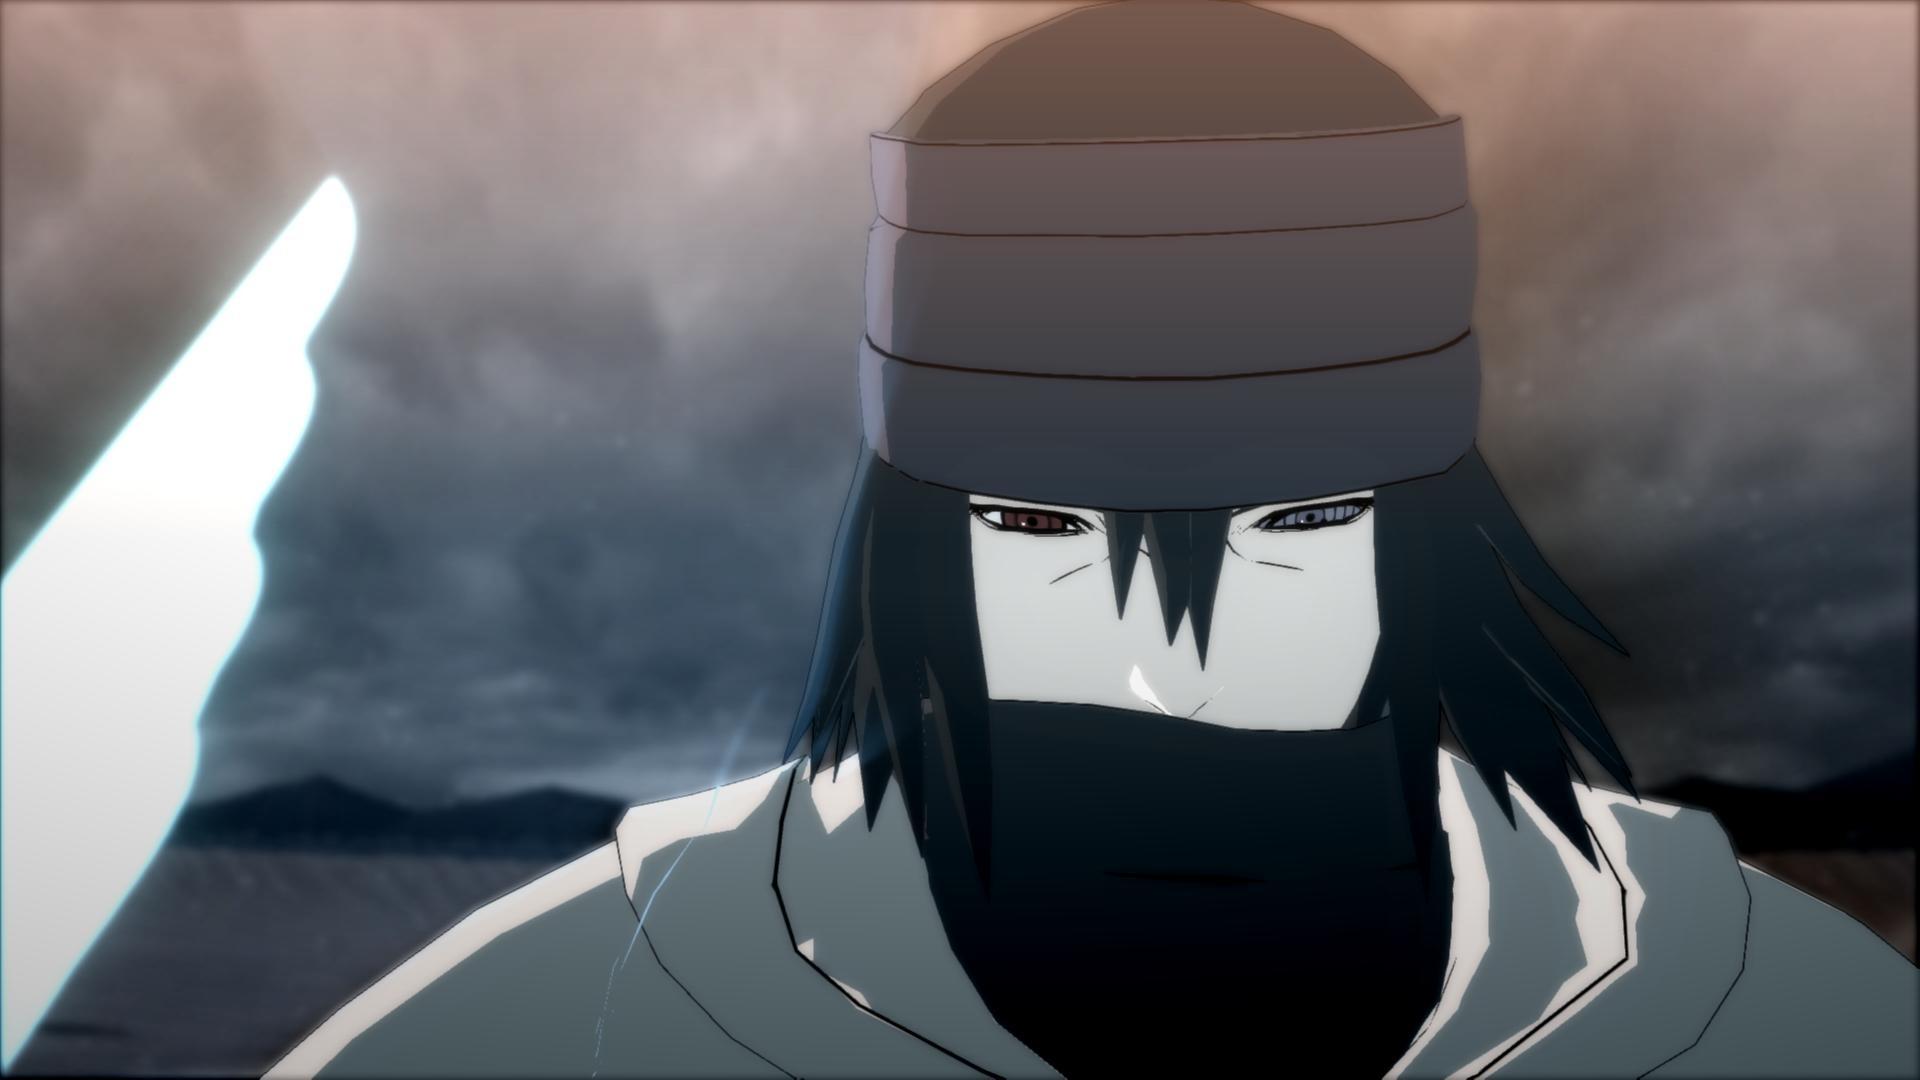 sasuke full hd fond d'écran and arrière-plan | 1920x1080 | id:683162